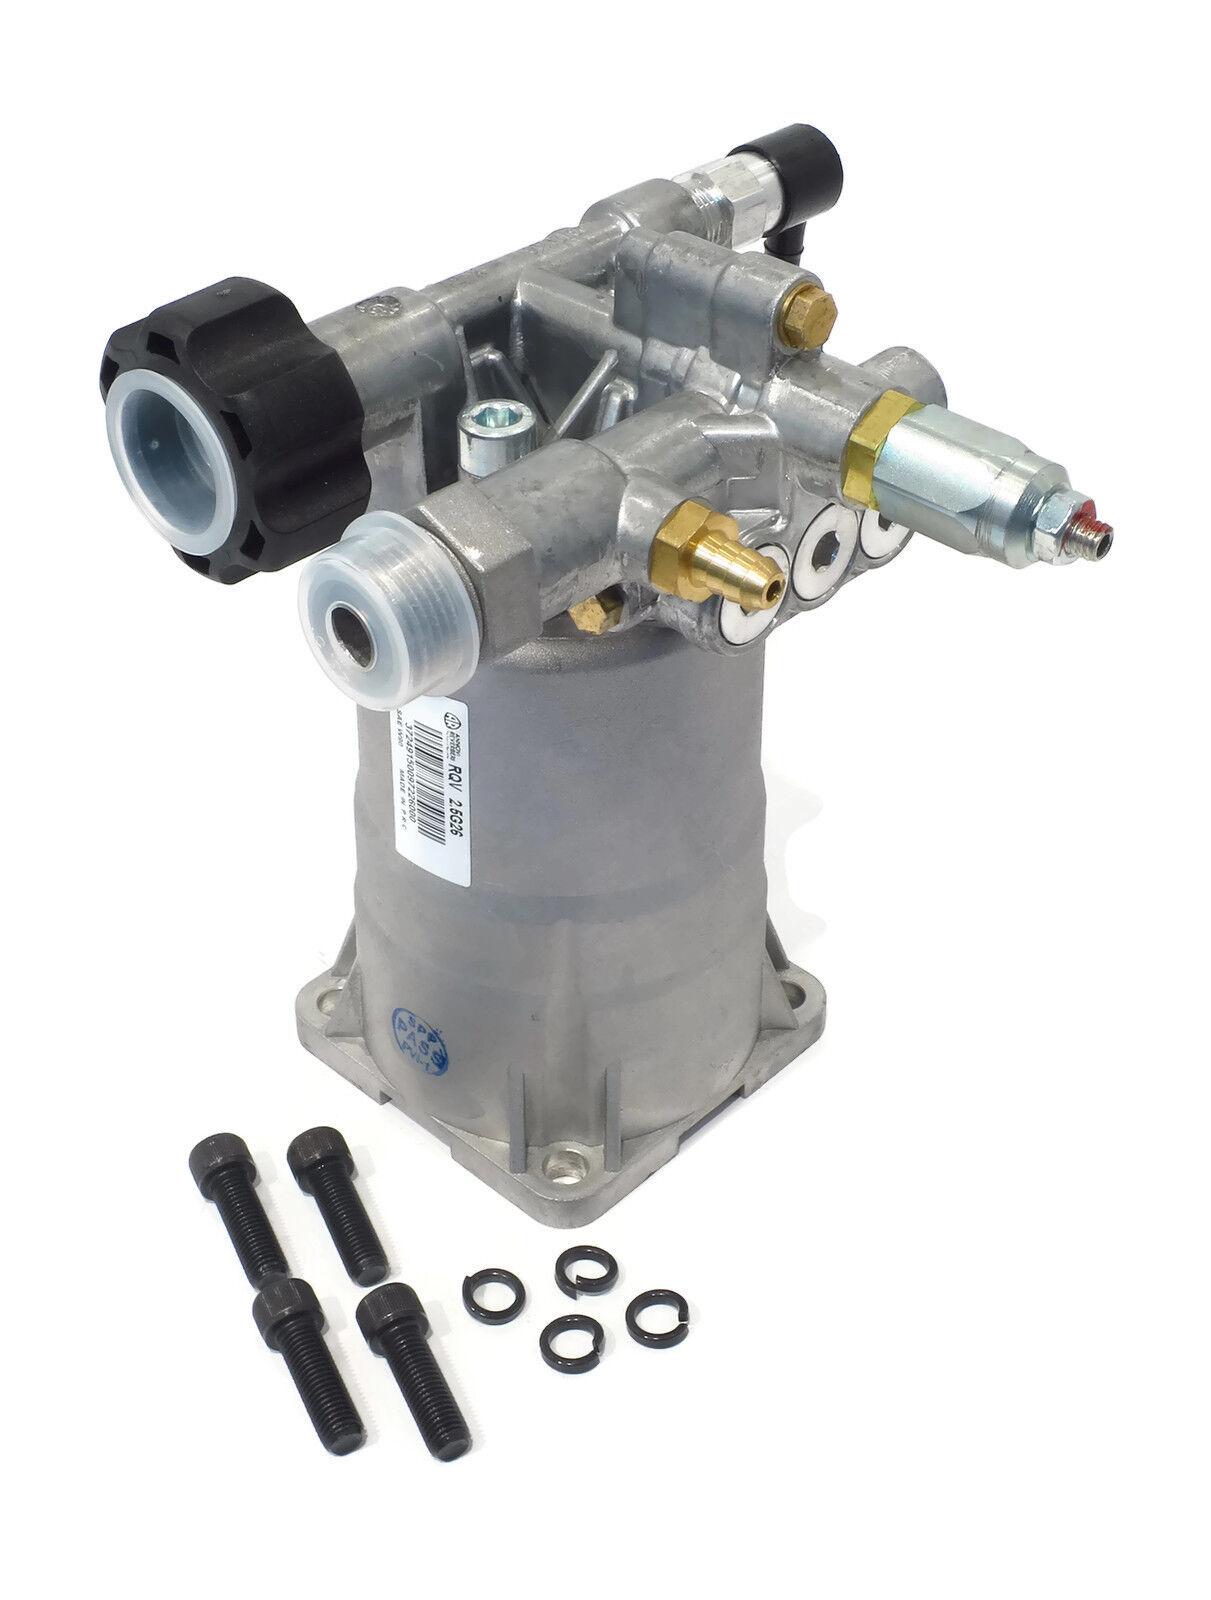 Nuevo 2600 PSI de presión de bomba de agua Lavado Bomba Porter Cable de alimentación 1503 CWBS 1503 CWBN 1503BKB